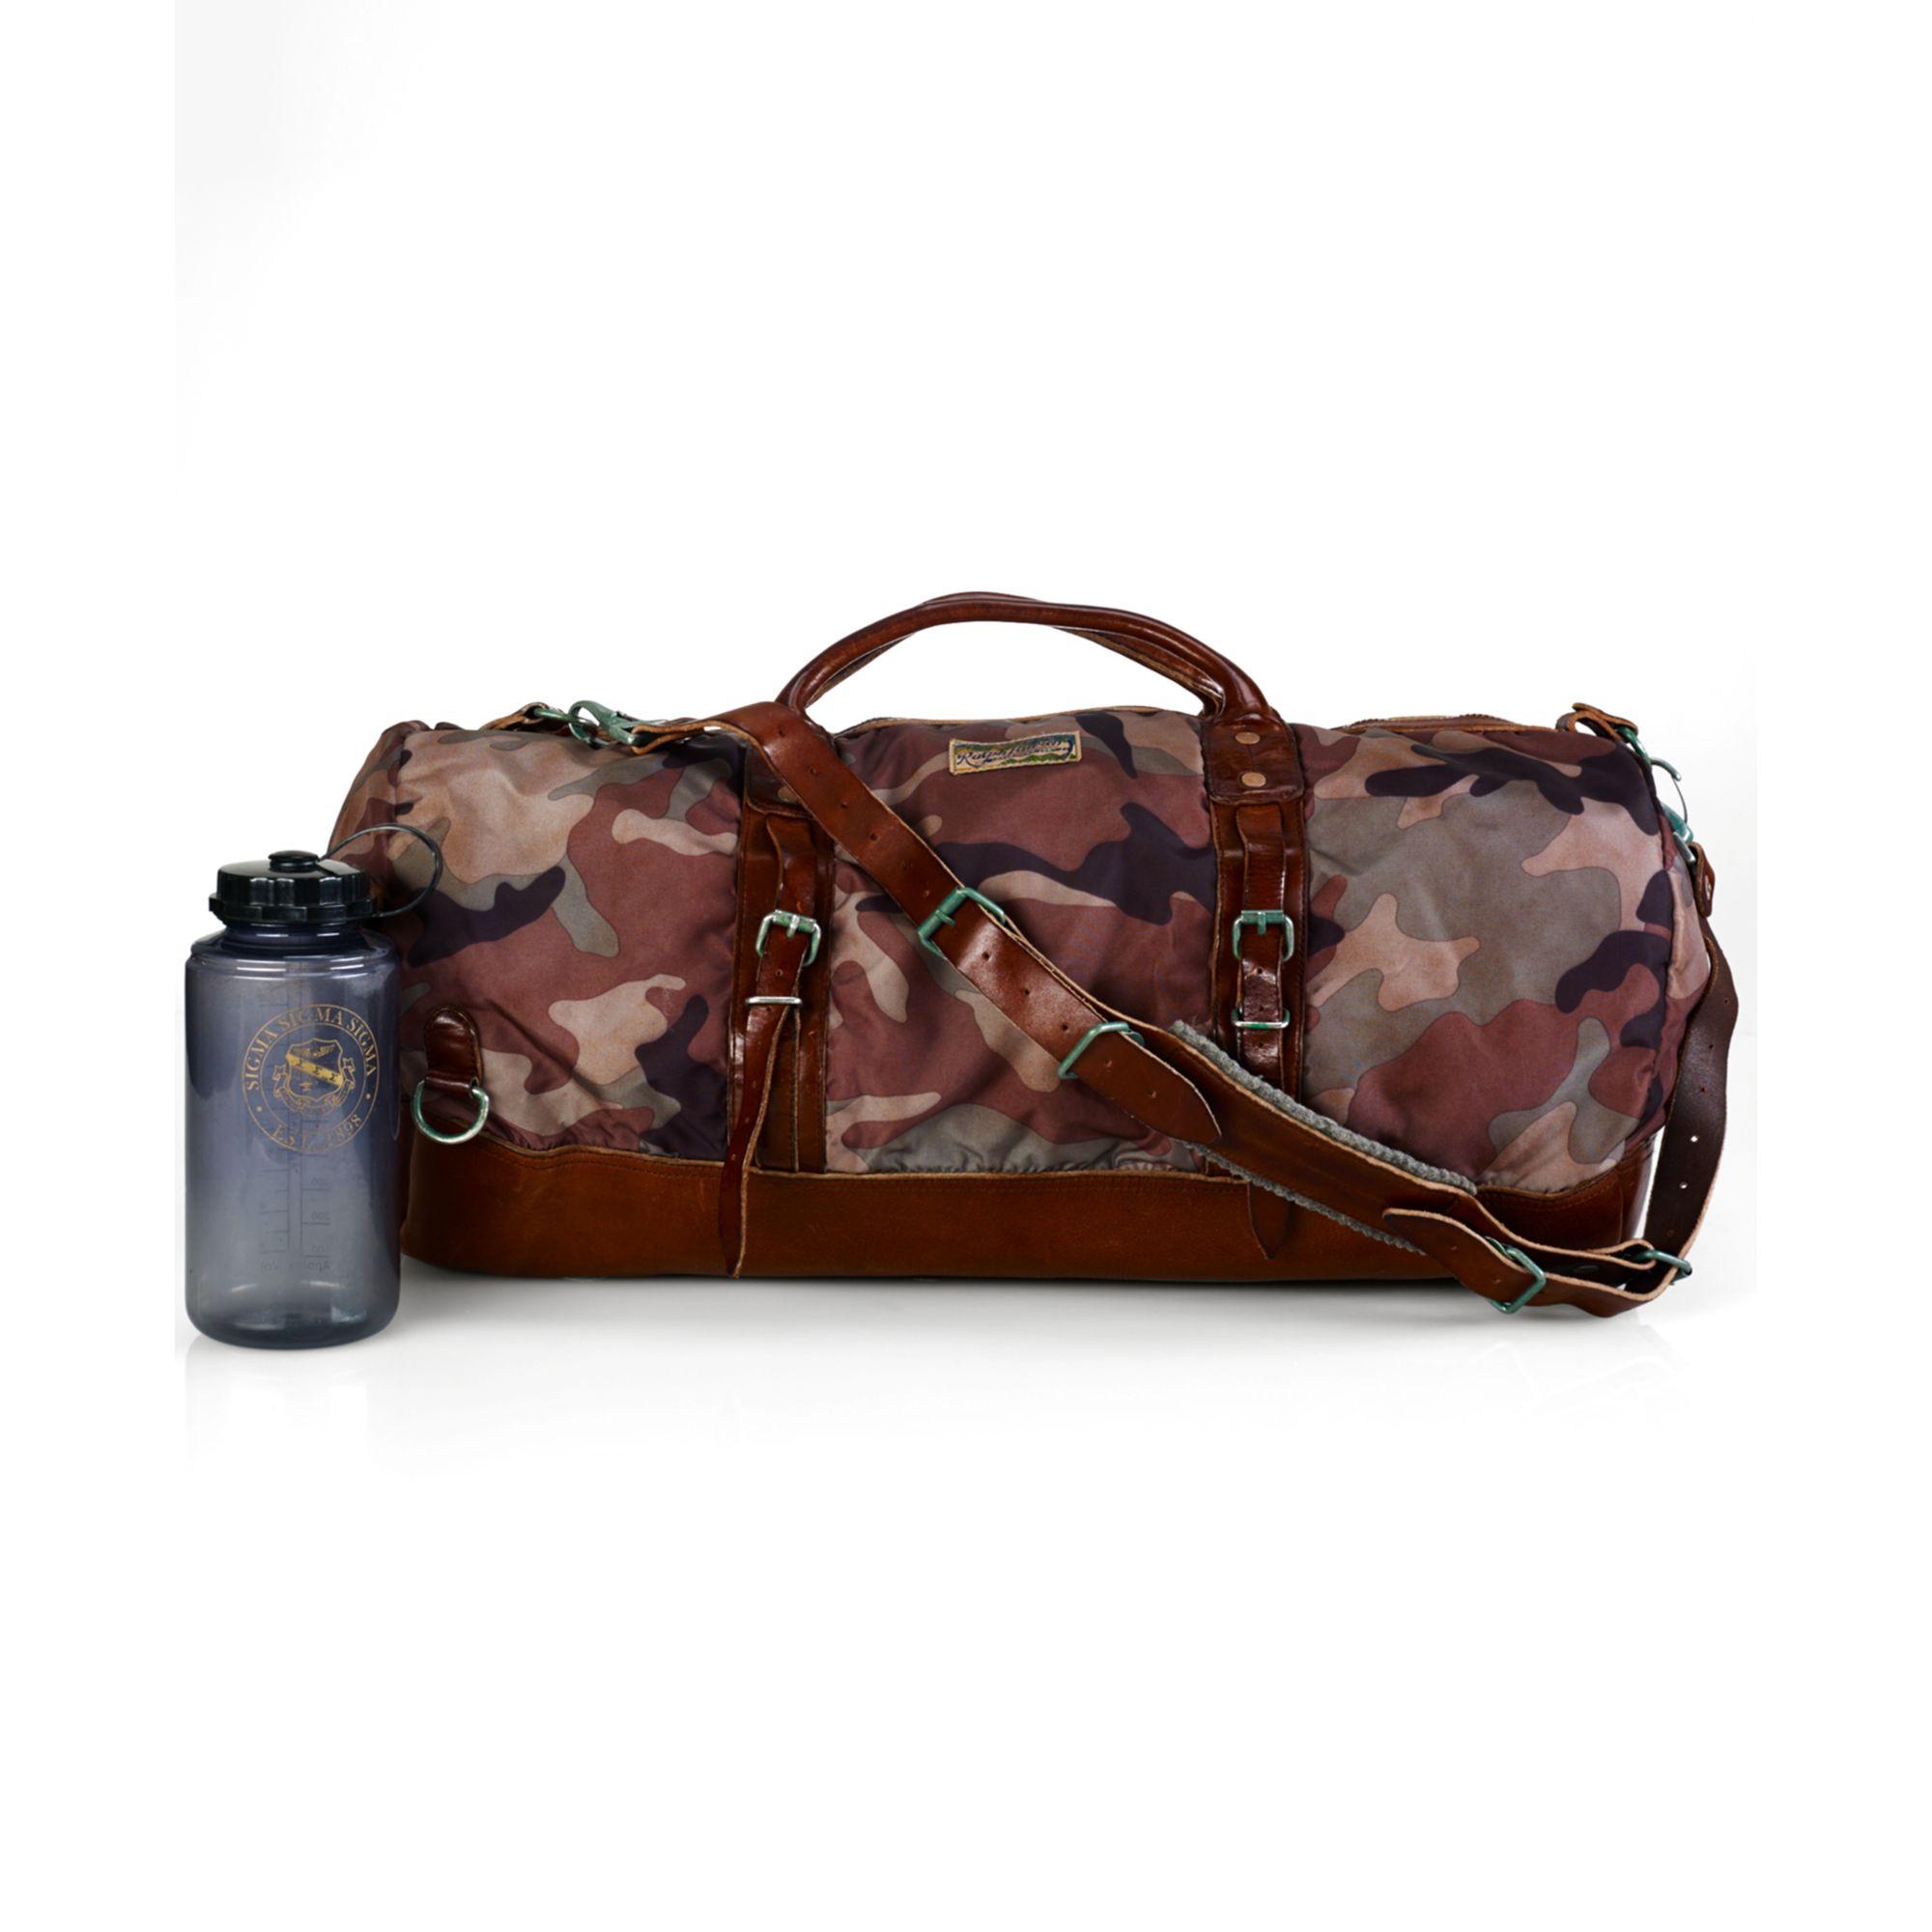 Lyst - Ralph Lauren Polo Camo Nylon Duffel Bag in Brown for Men e71cdf5d9dfb0